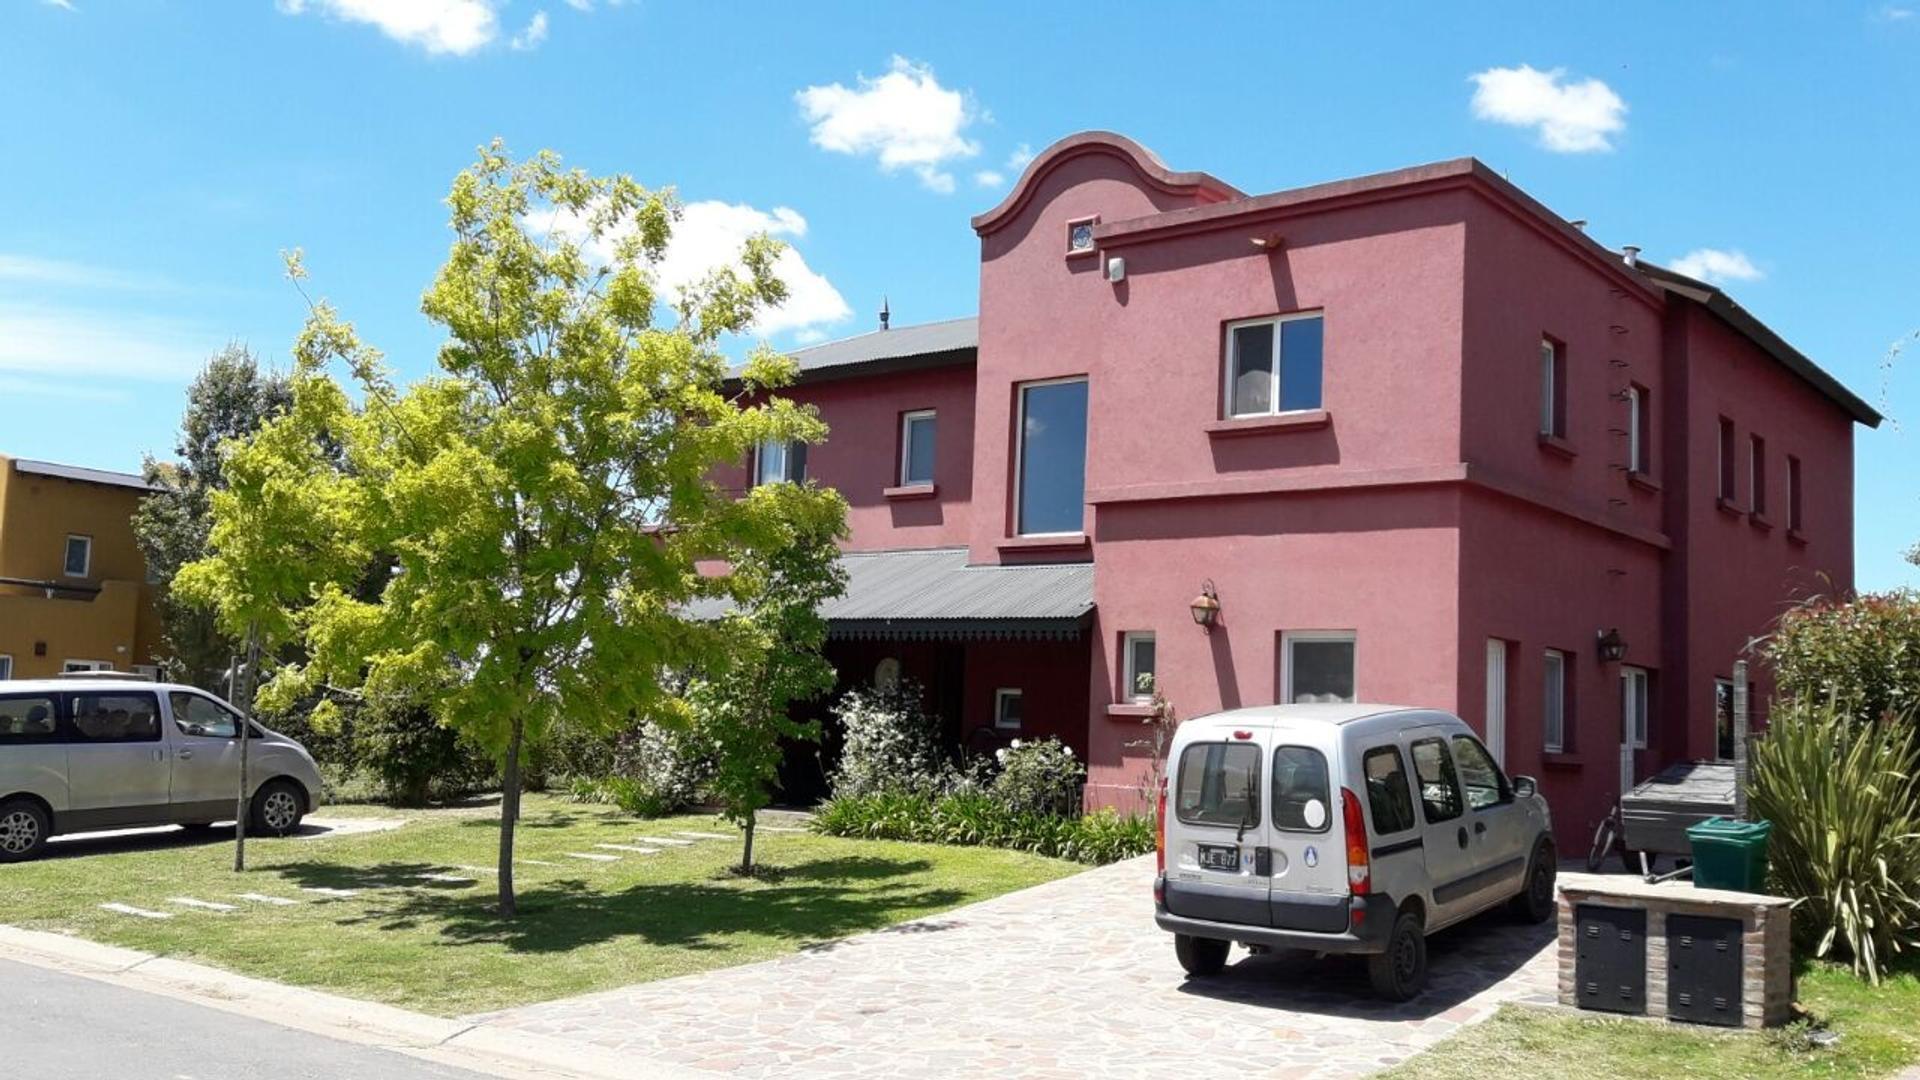 Casa en Venta, Bº San Benito, 575.000 U$S.